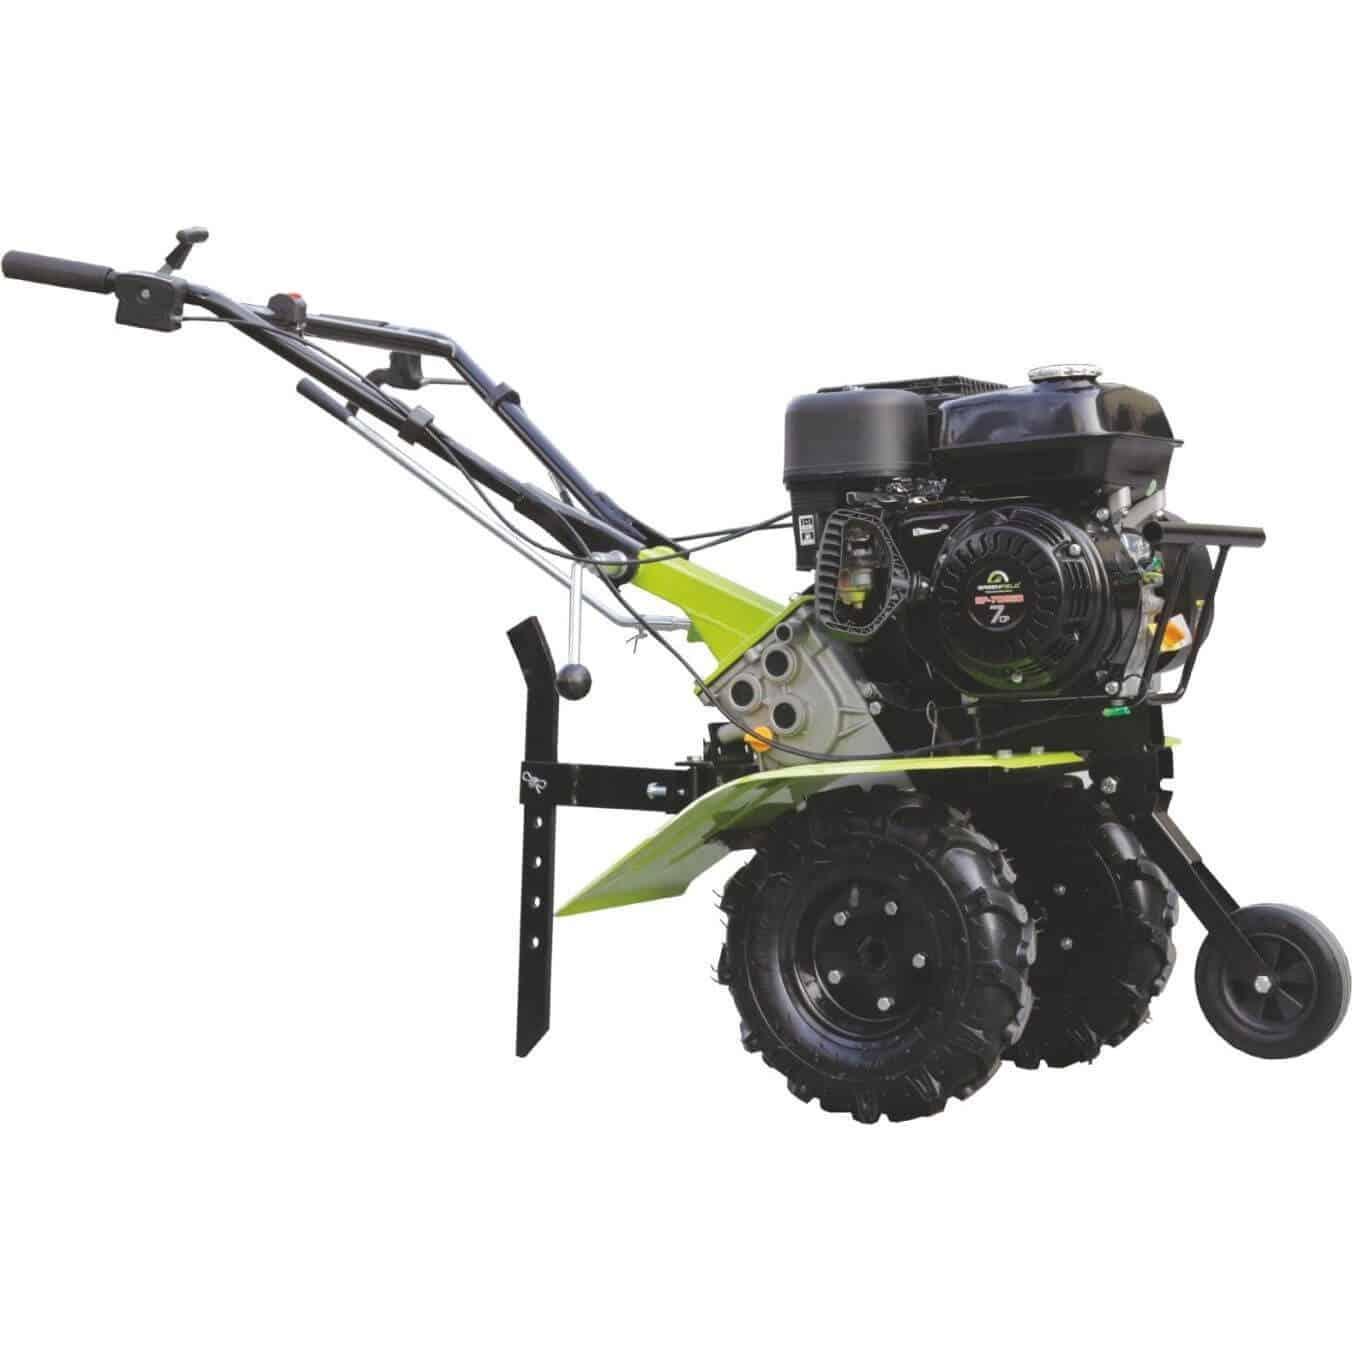 Motosapa 208 cmc, 7 CP, GREENFIELD, GP-7085B - oferta noua